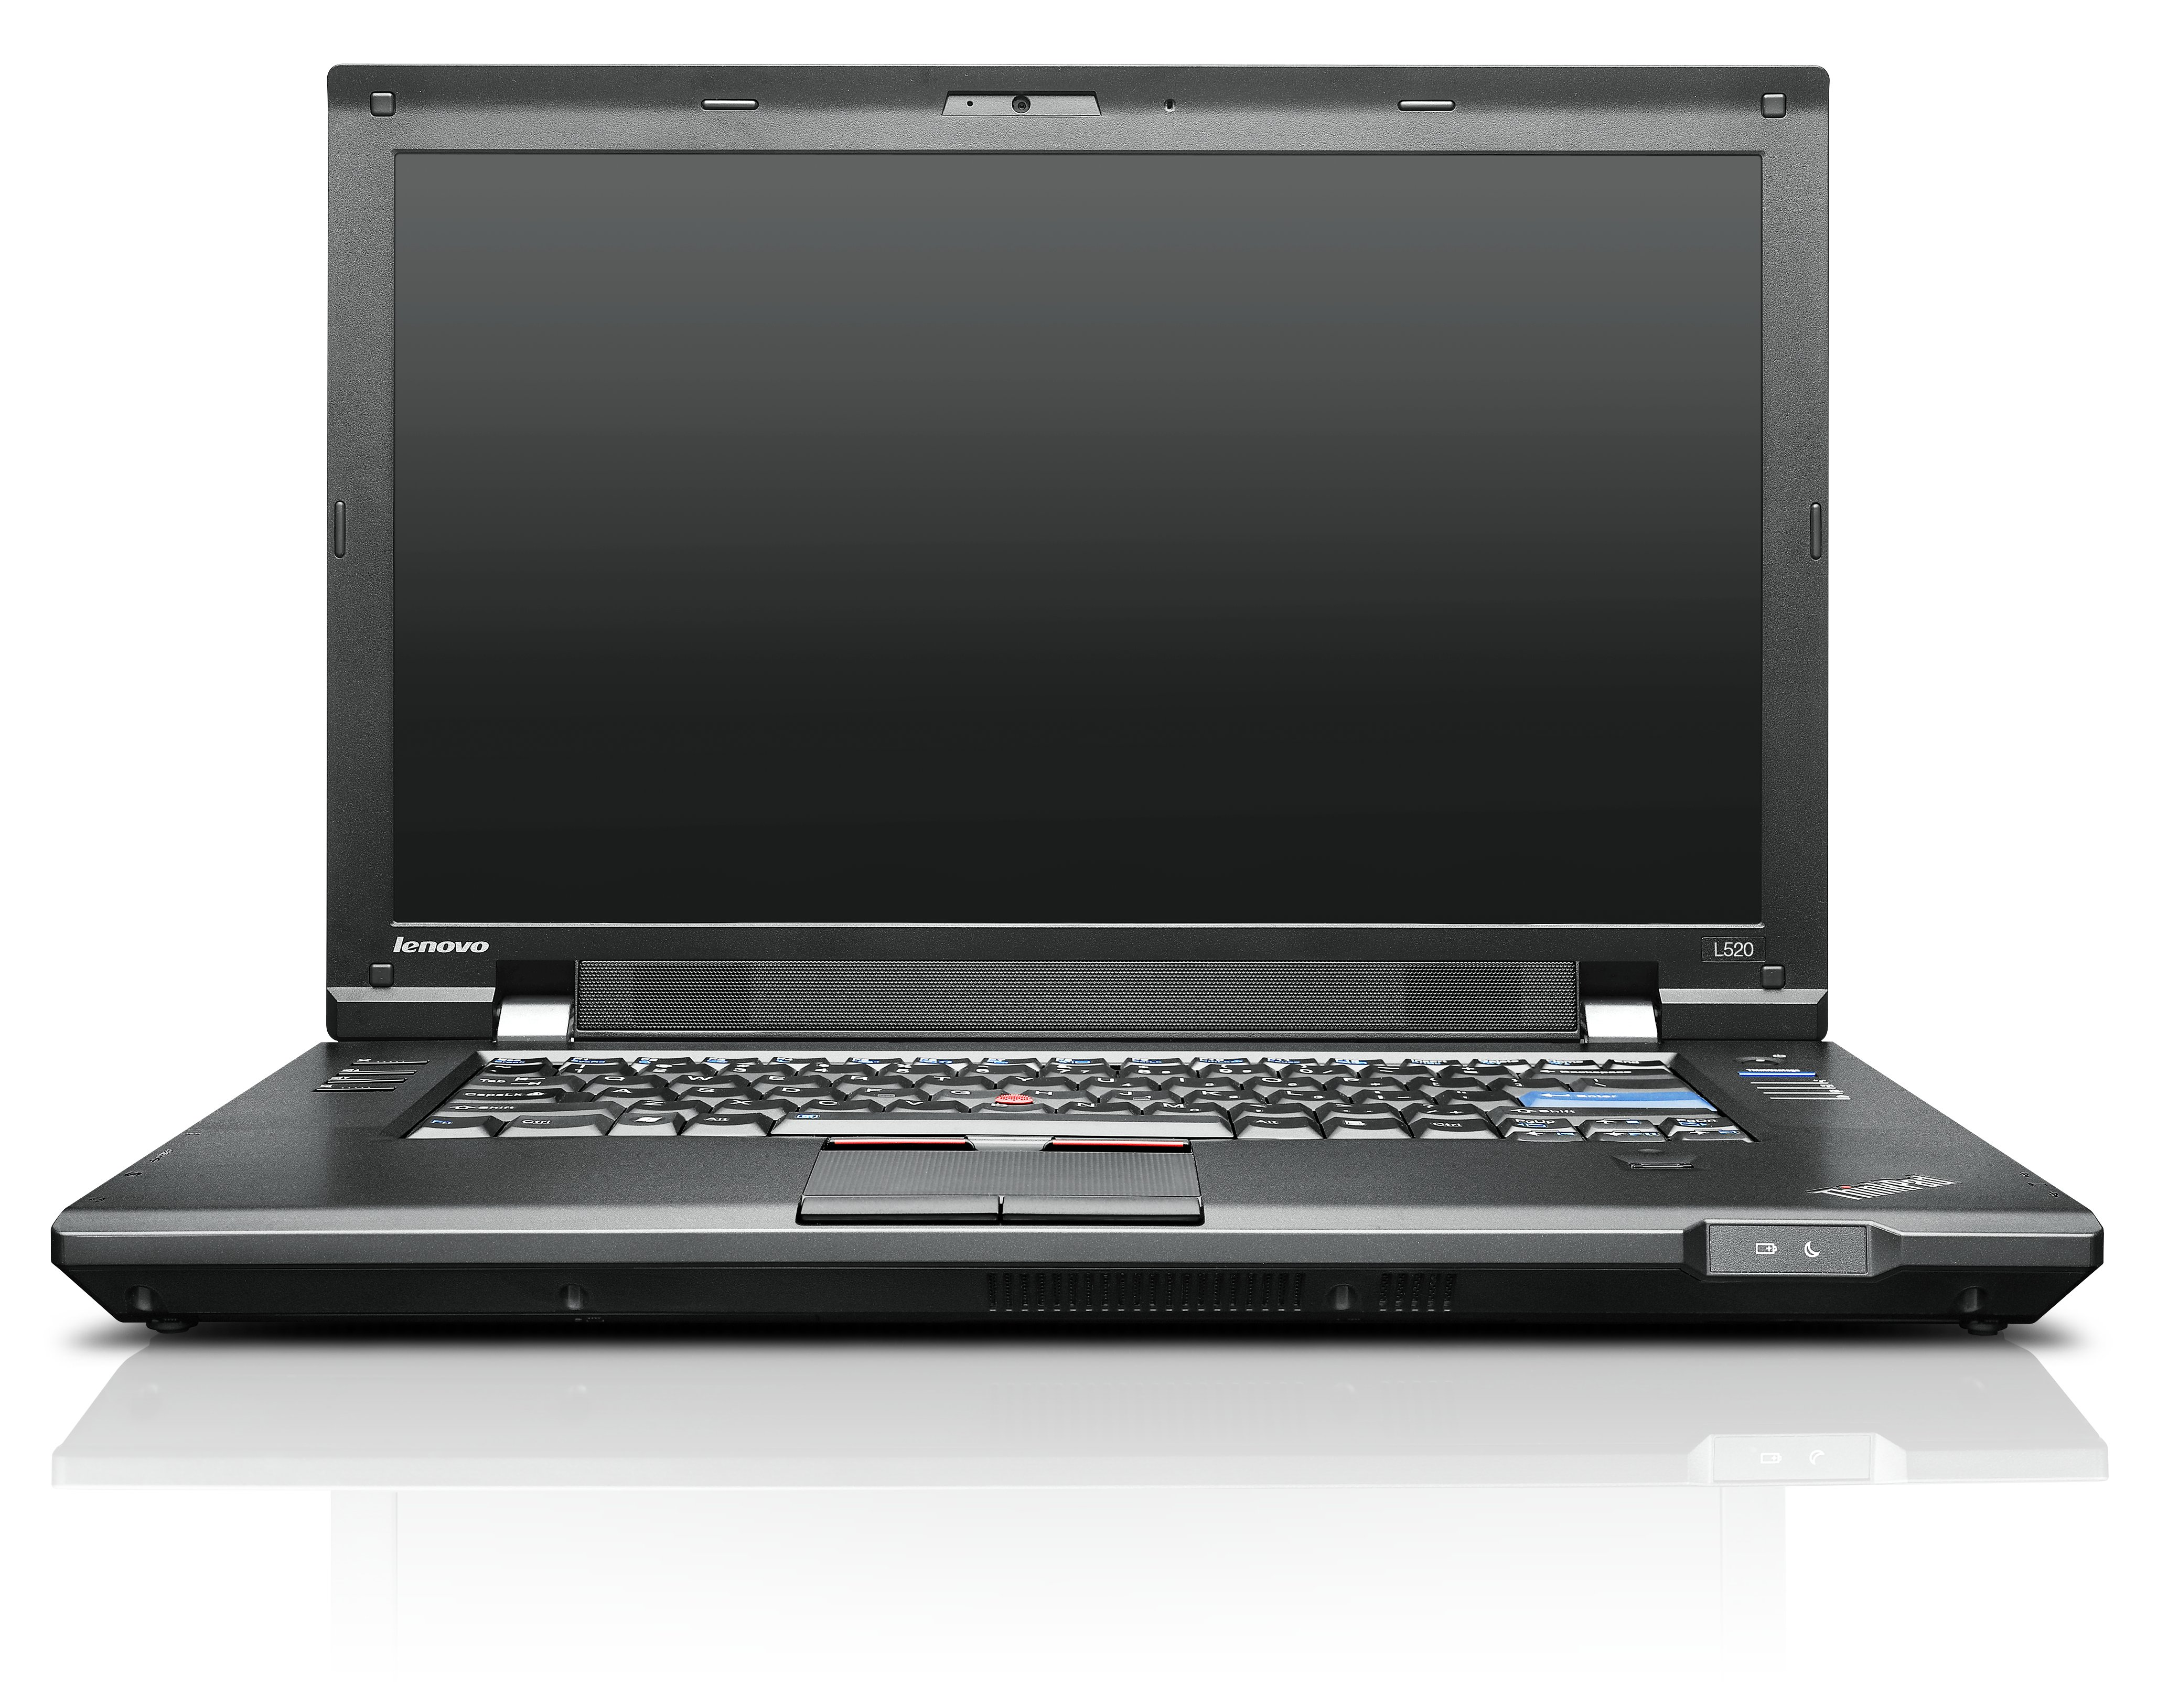 Drivers for Lenovo Thinkpad L520 HUAWEI WWAN